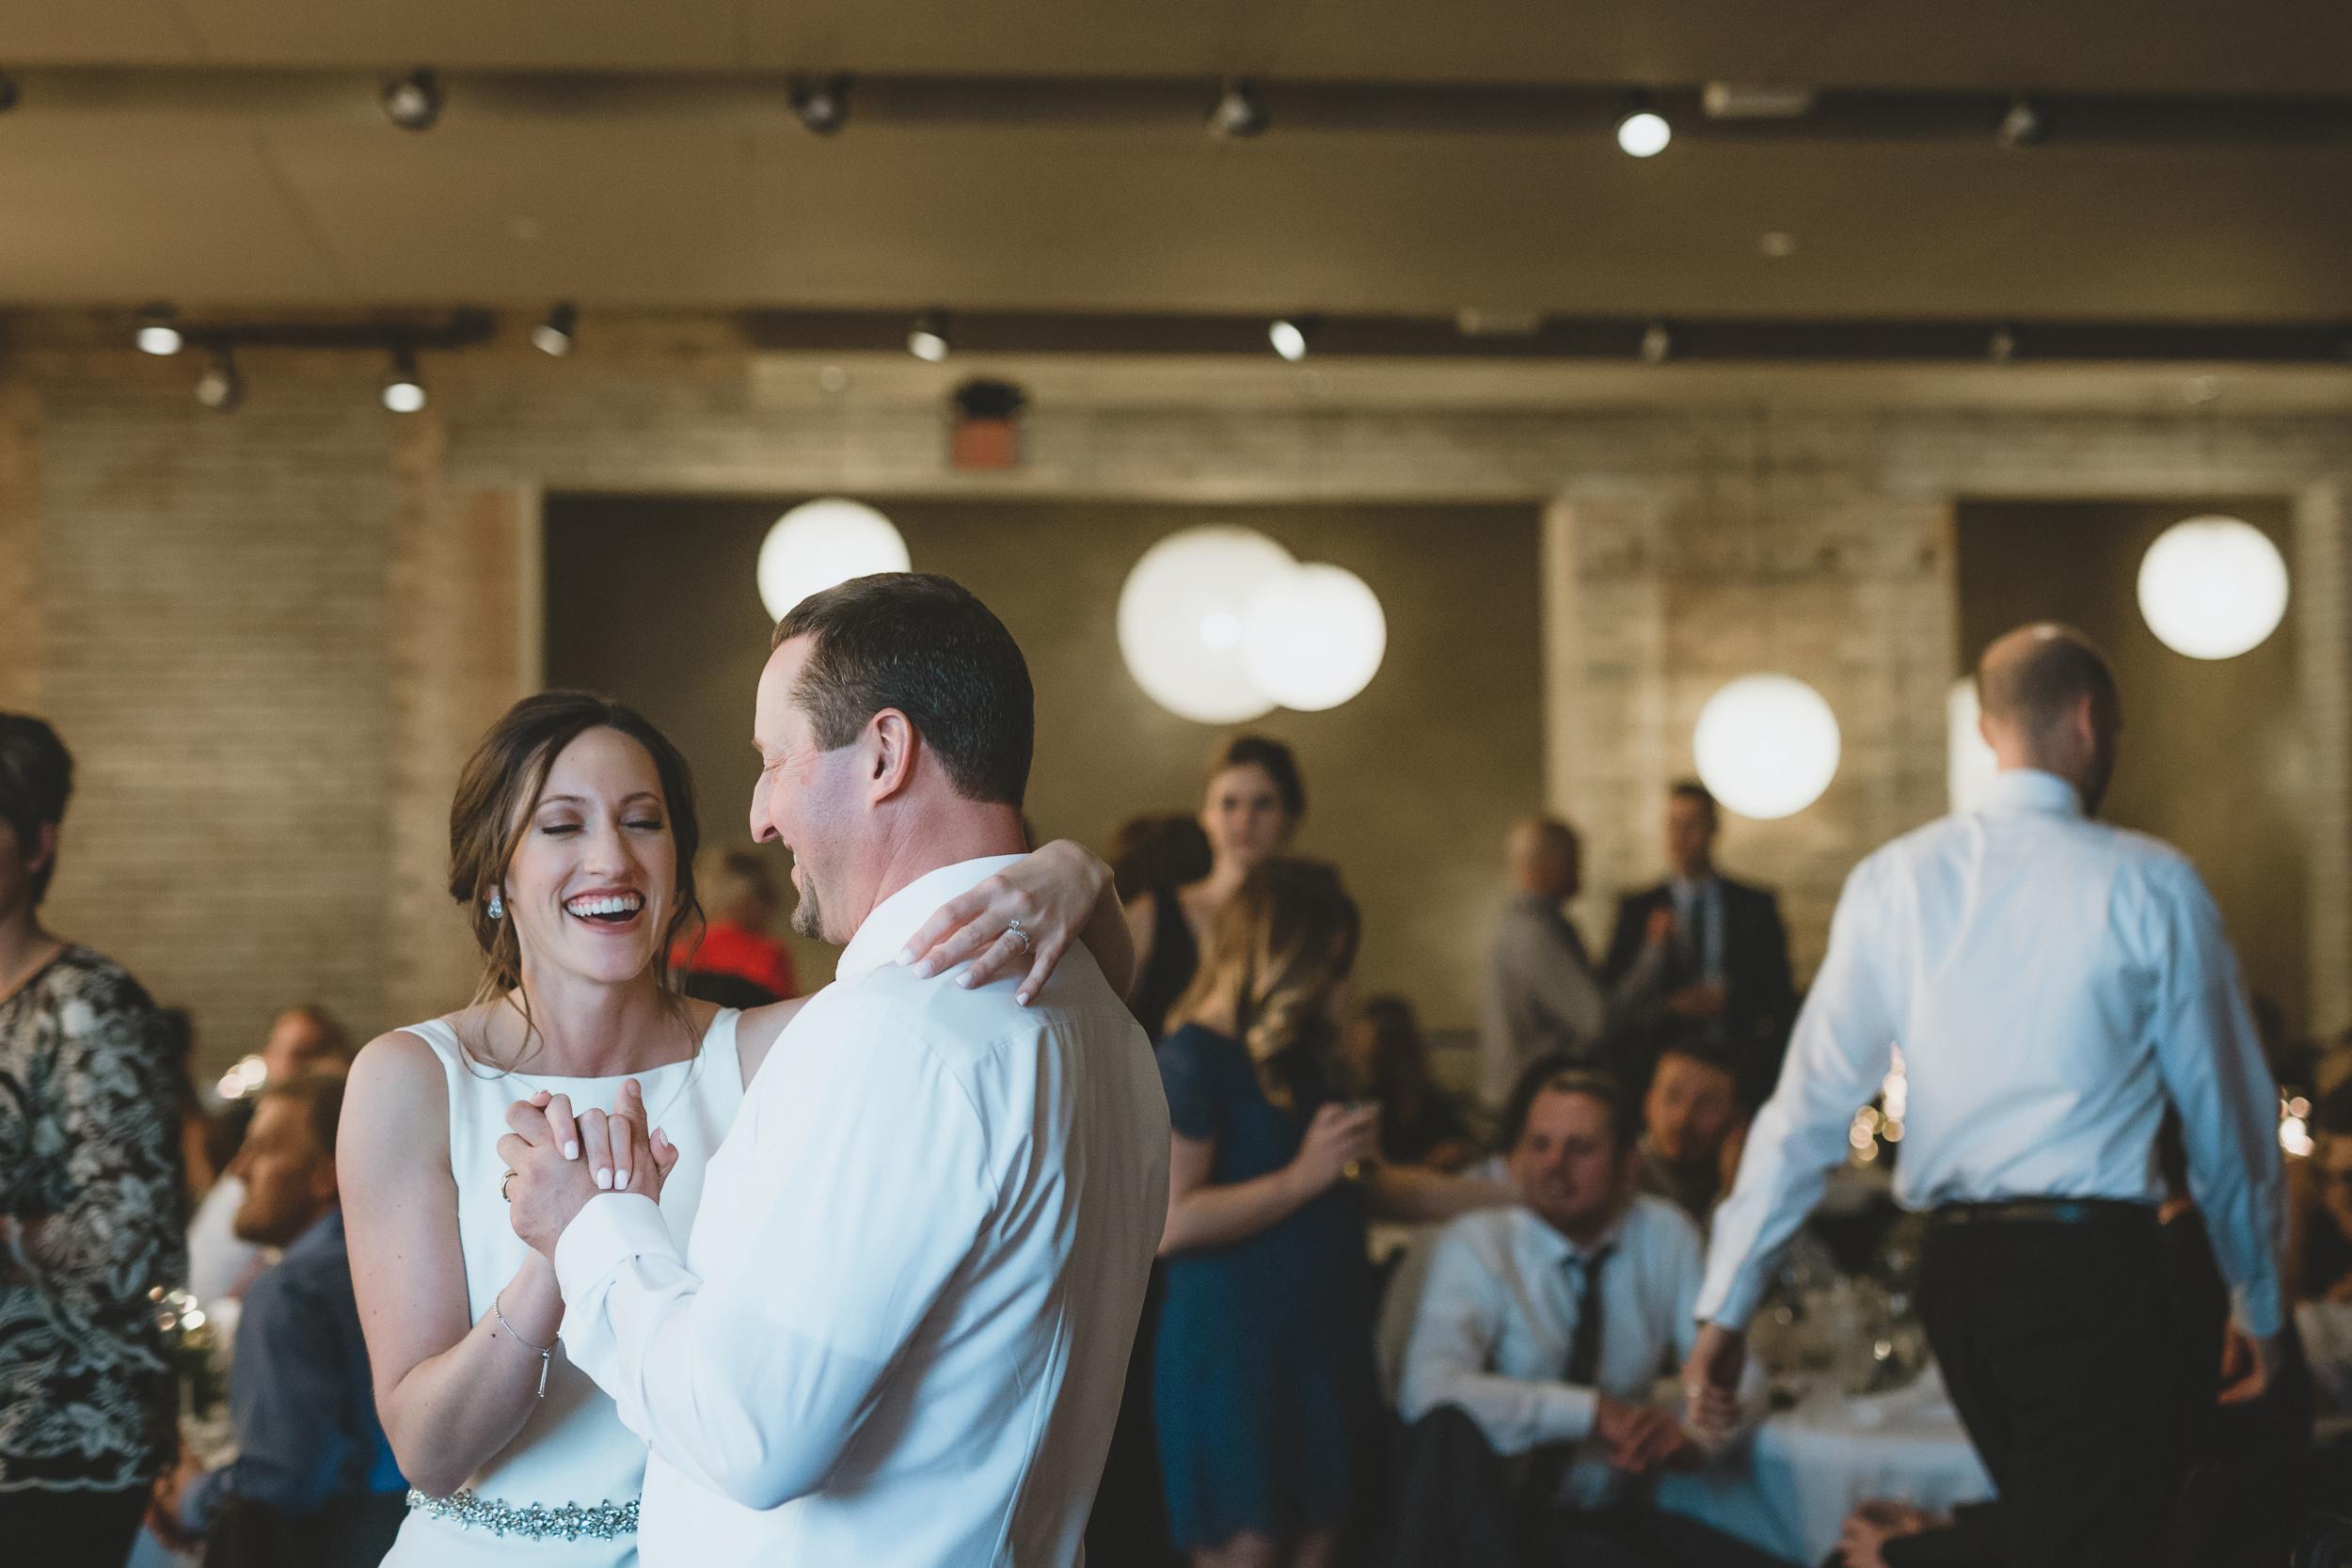 five event center uptown minneapolis wedding-76.jpg